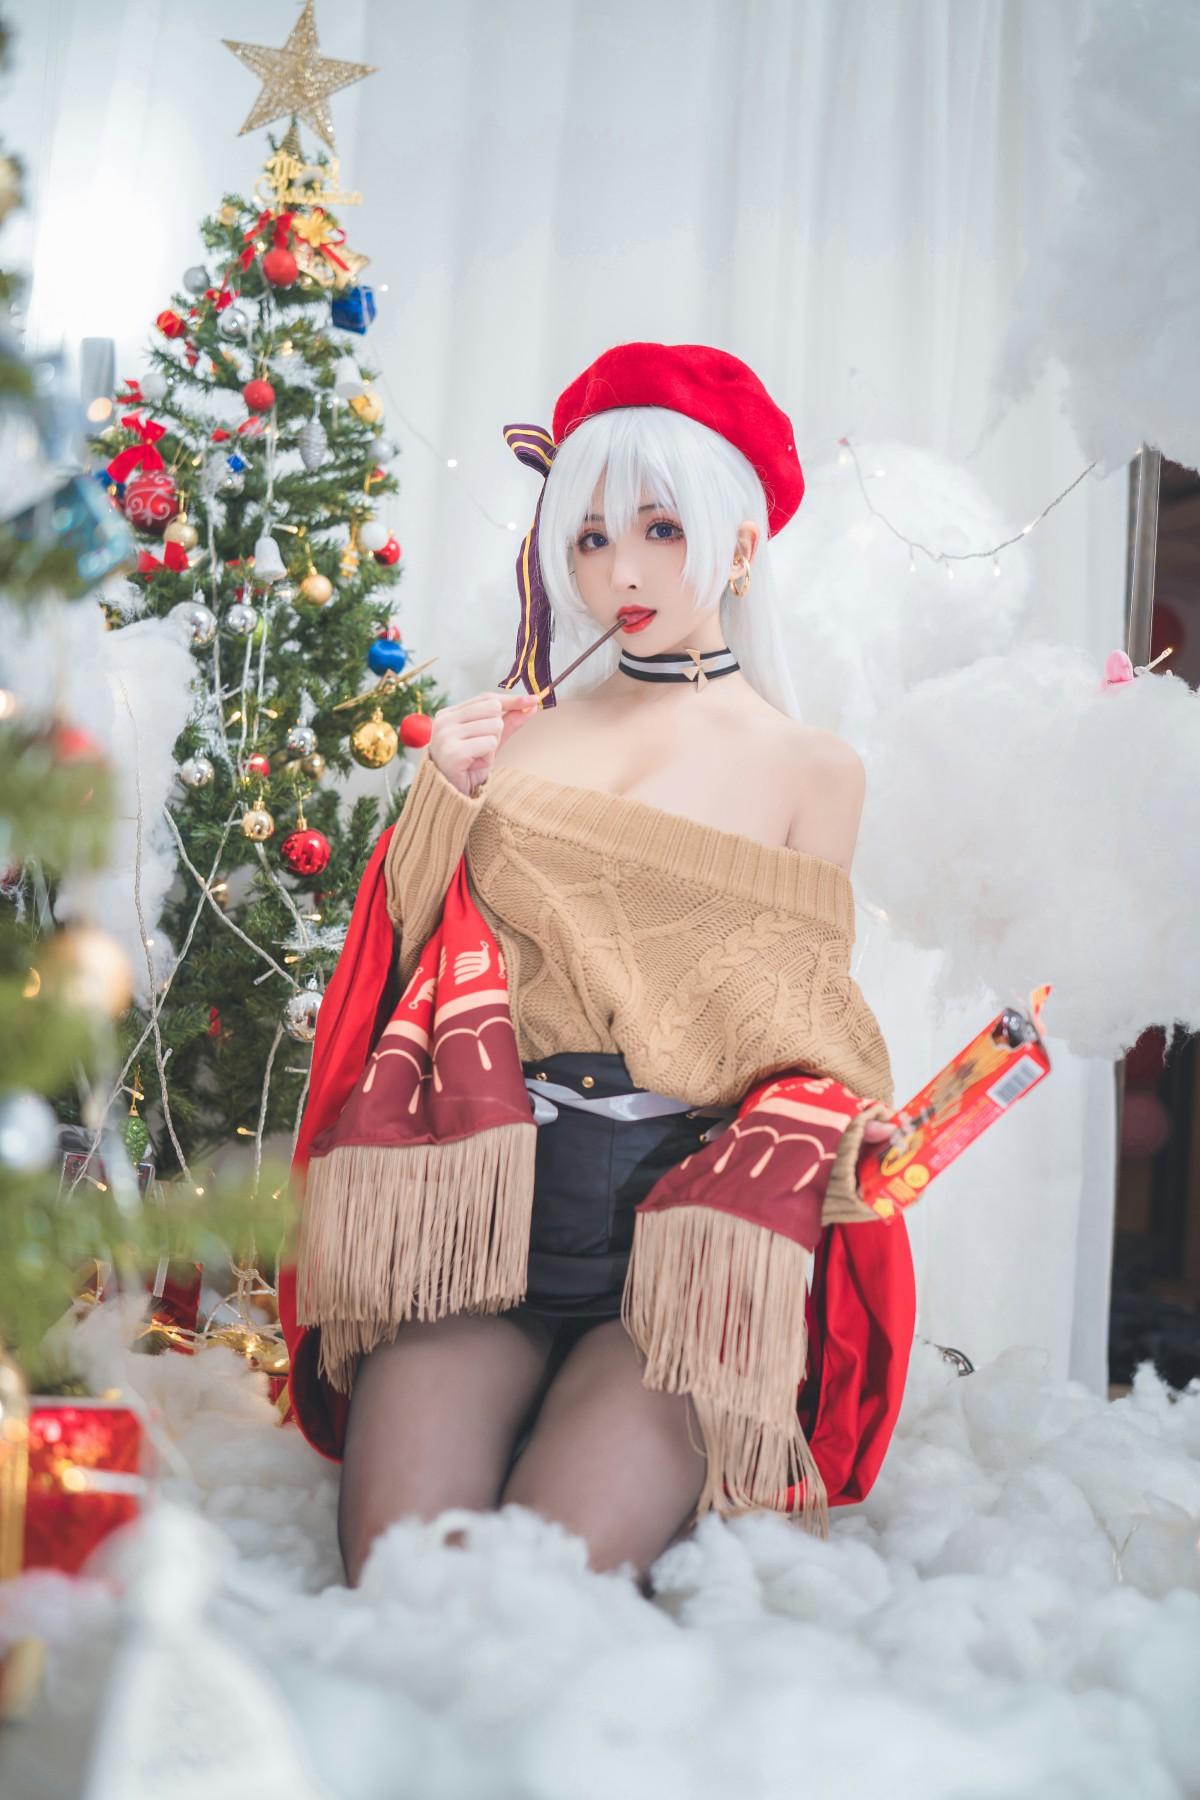 [Cosplay]rioko凉凉子 贝尔法斯特 圣诞装[24P] 角色扮演 第2张